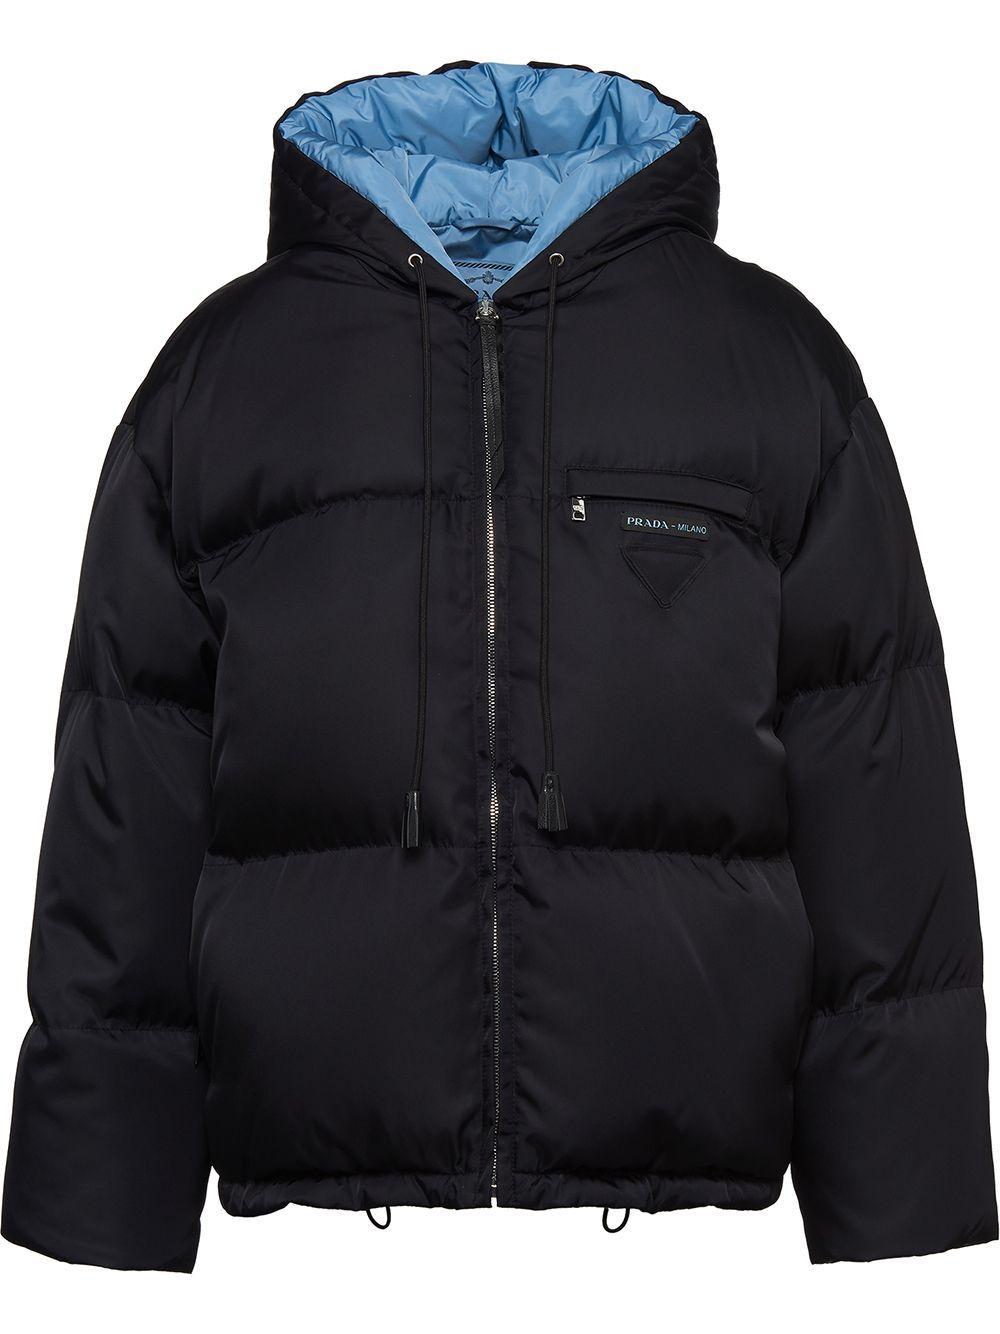 Prada Oversized Puffer Jacket Farfetch Puffer Jackets Jackets Oversized Puffer Jacket [ 1334 x 1000 Pixel ]